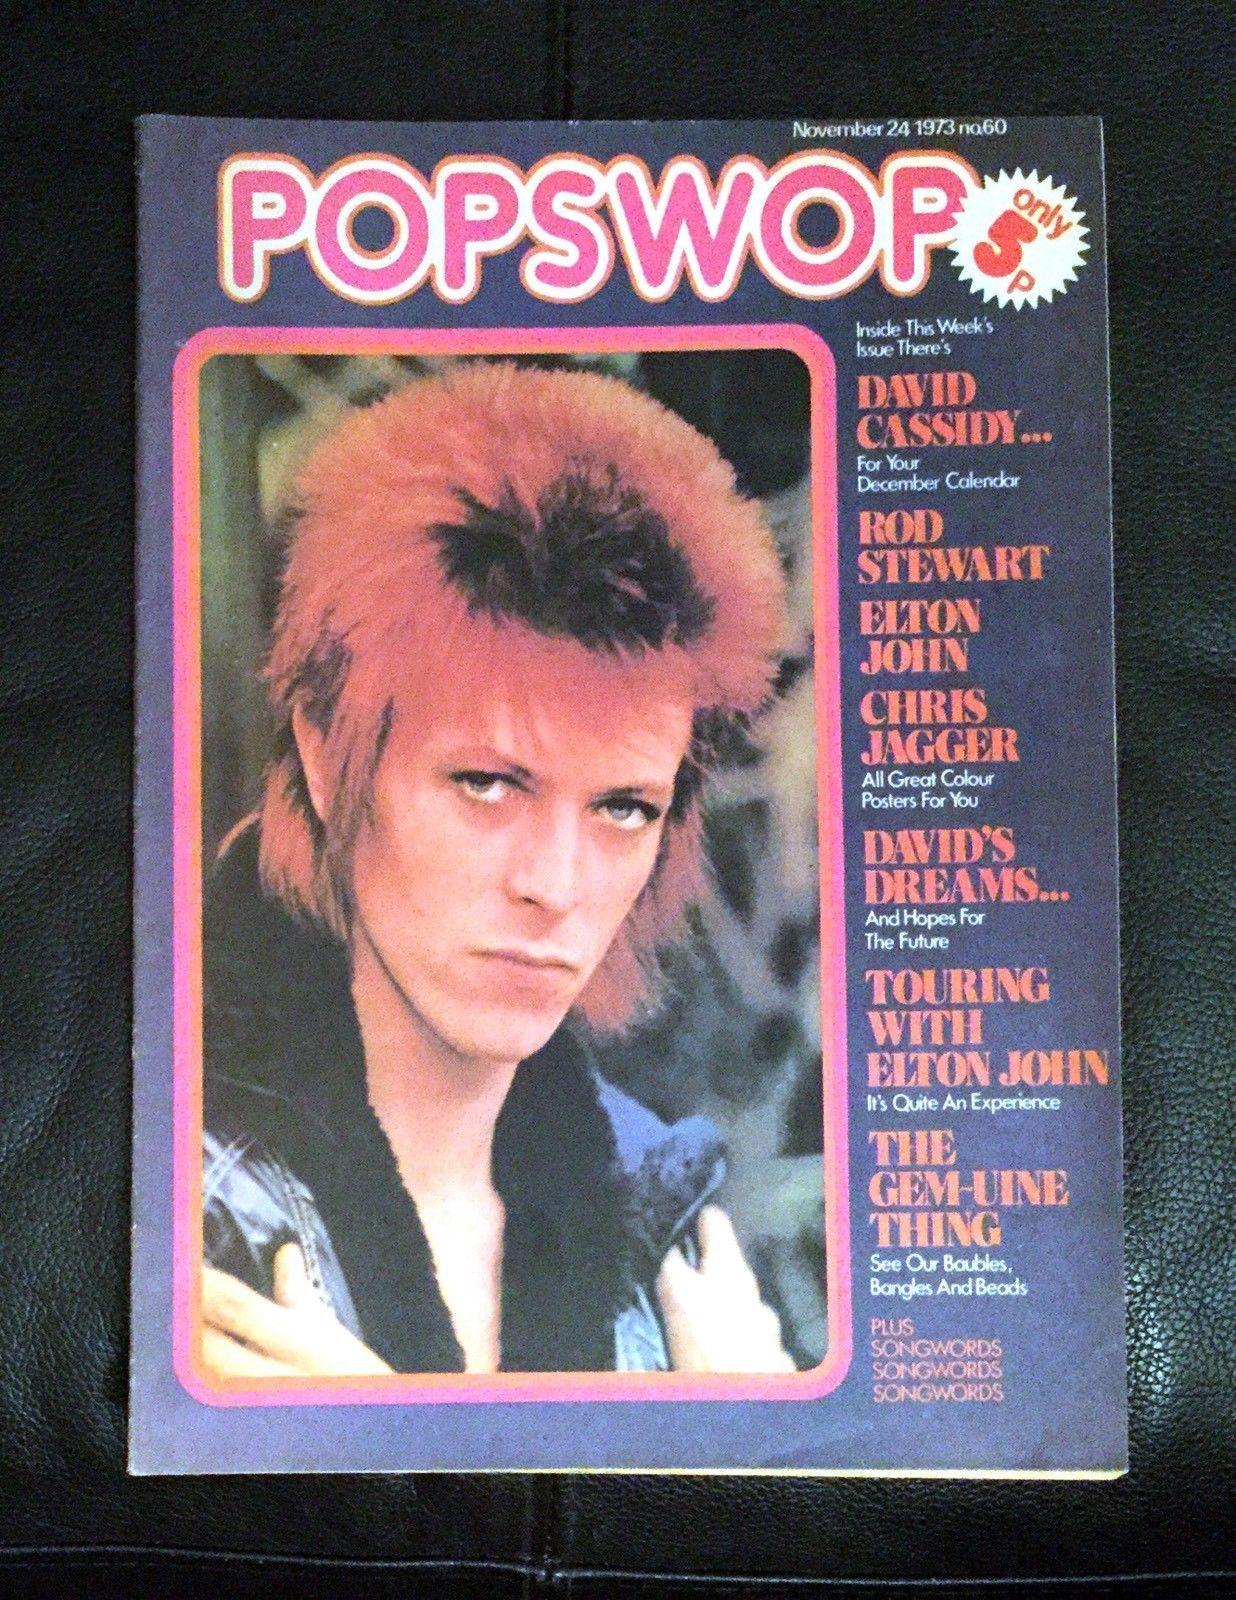 Popswop 1973 David Cassidy Elton John David Bowie Rod Stewart